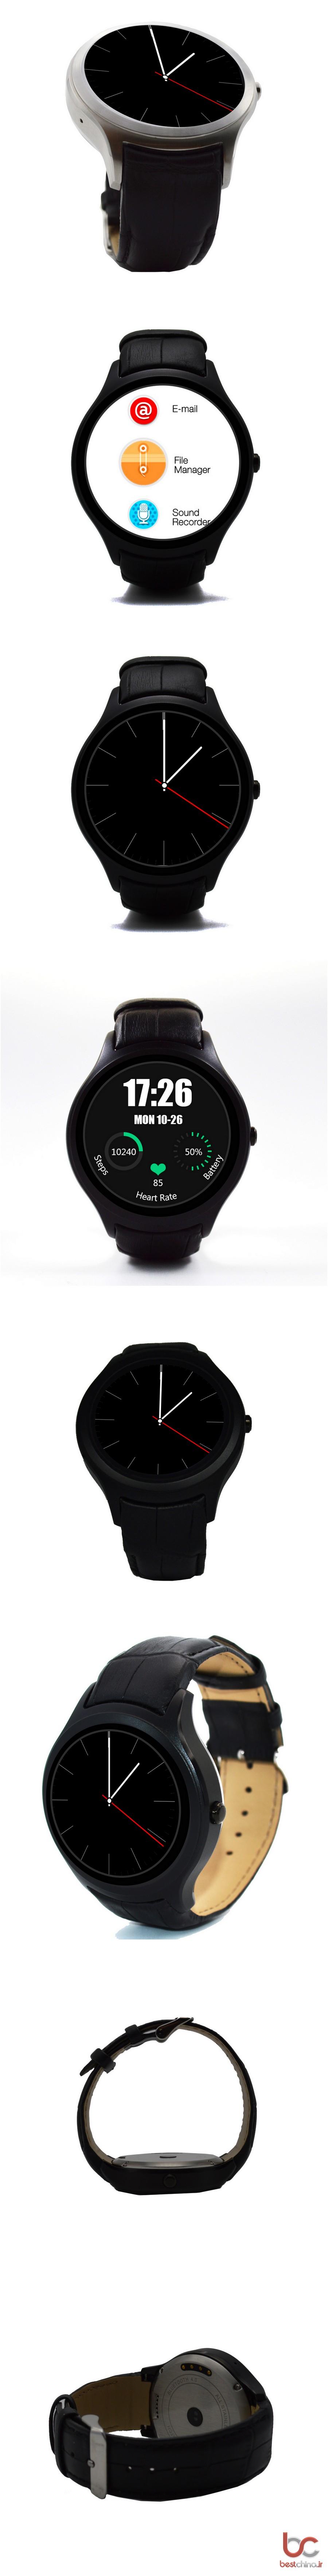 NO.1 D5 smartwatch (4)